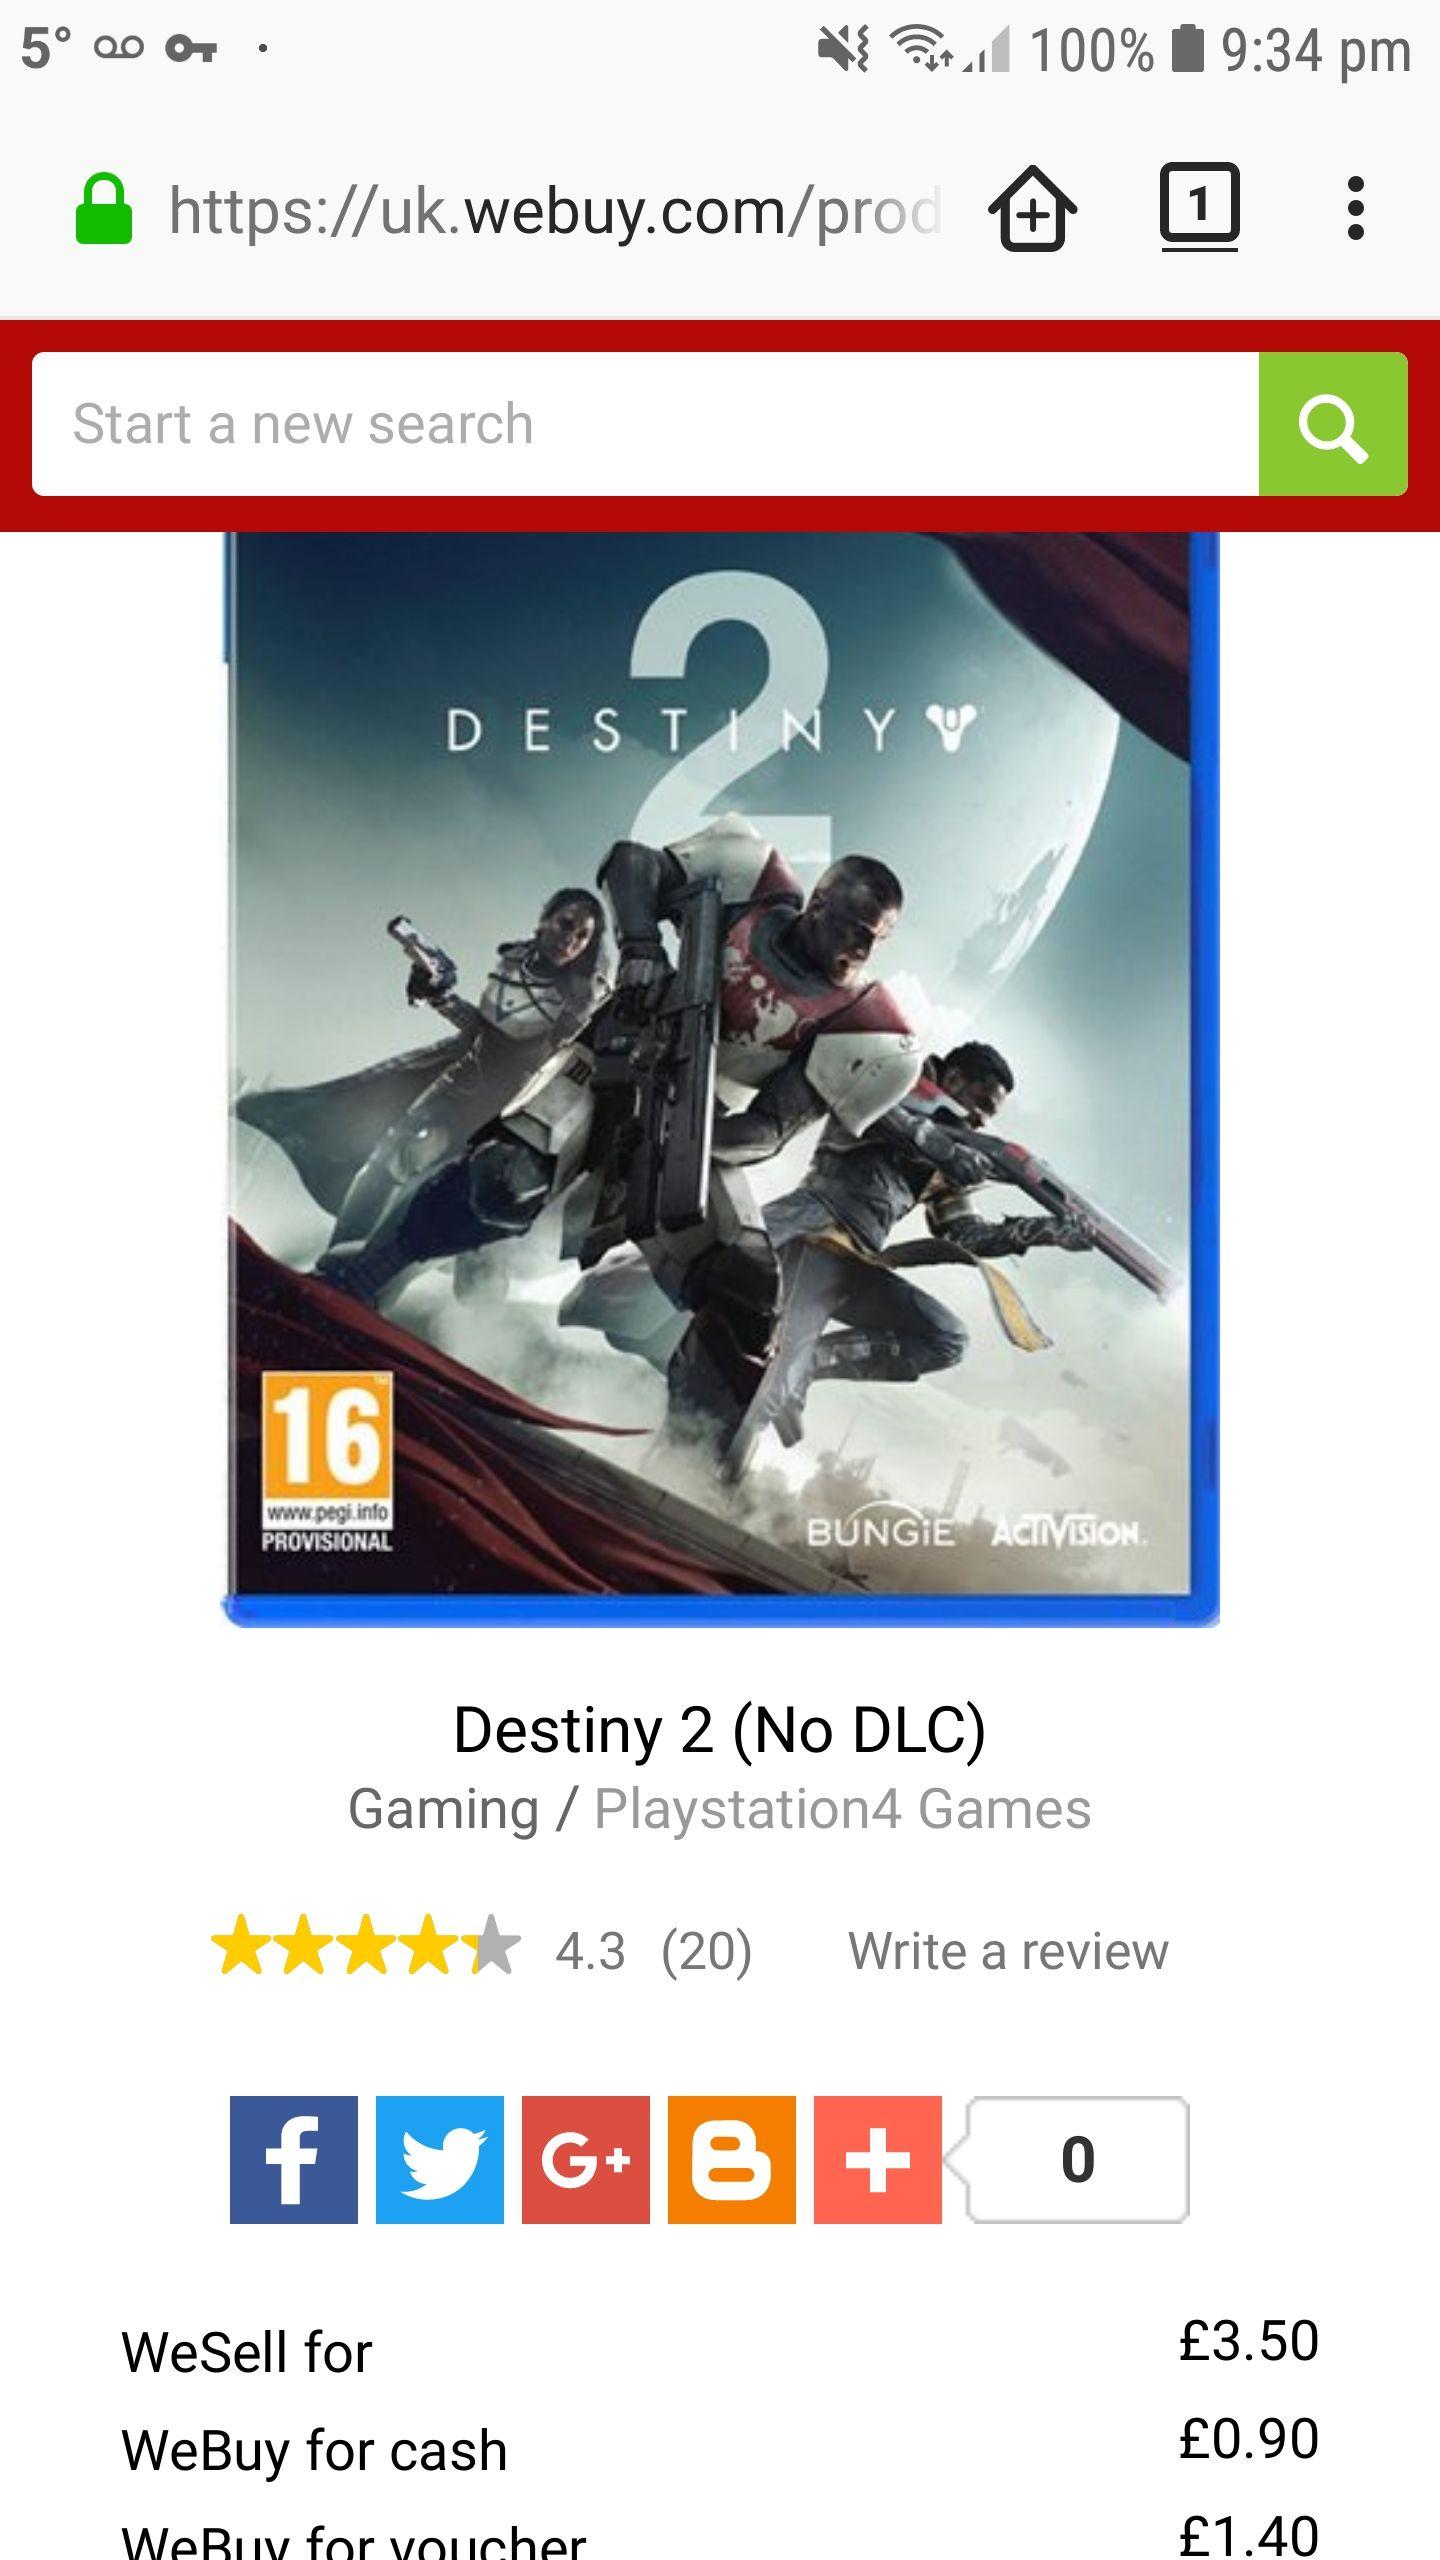 Destiny 2 PS4 - £3.50 @CeX